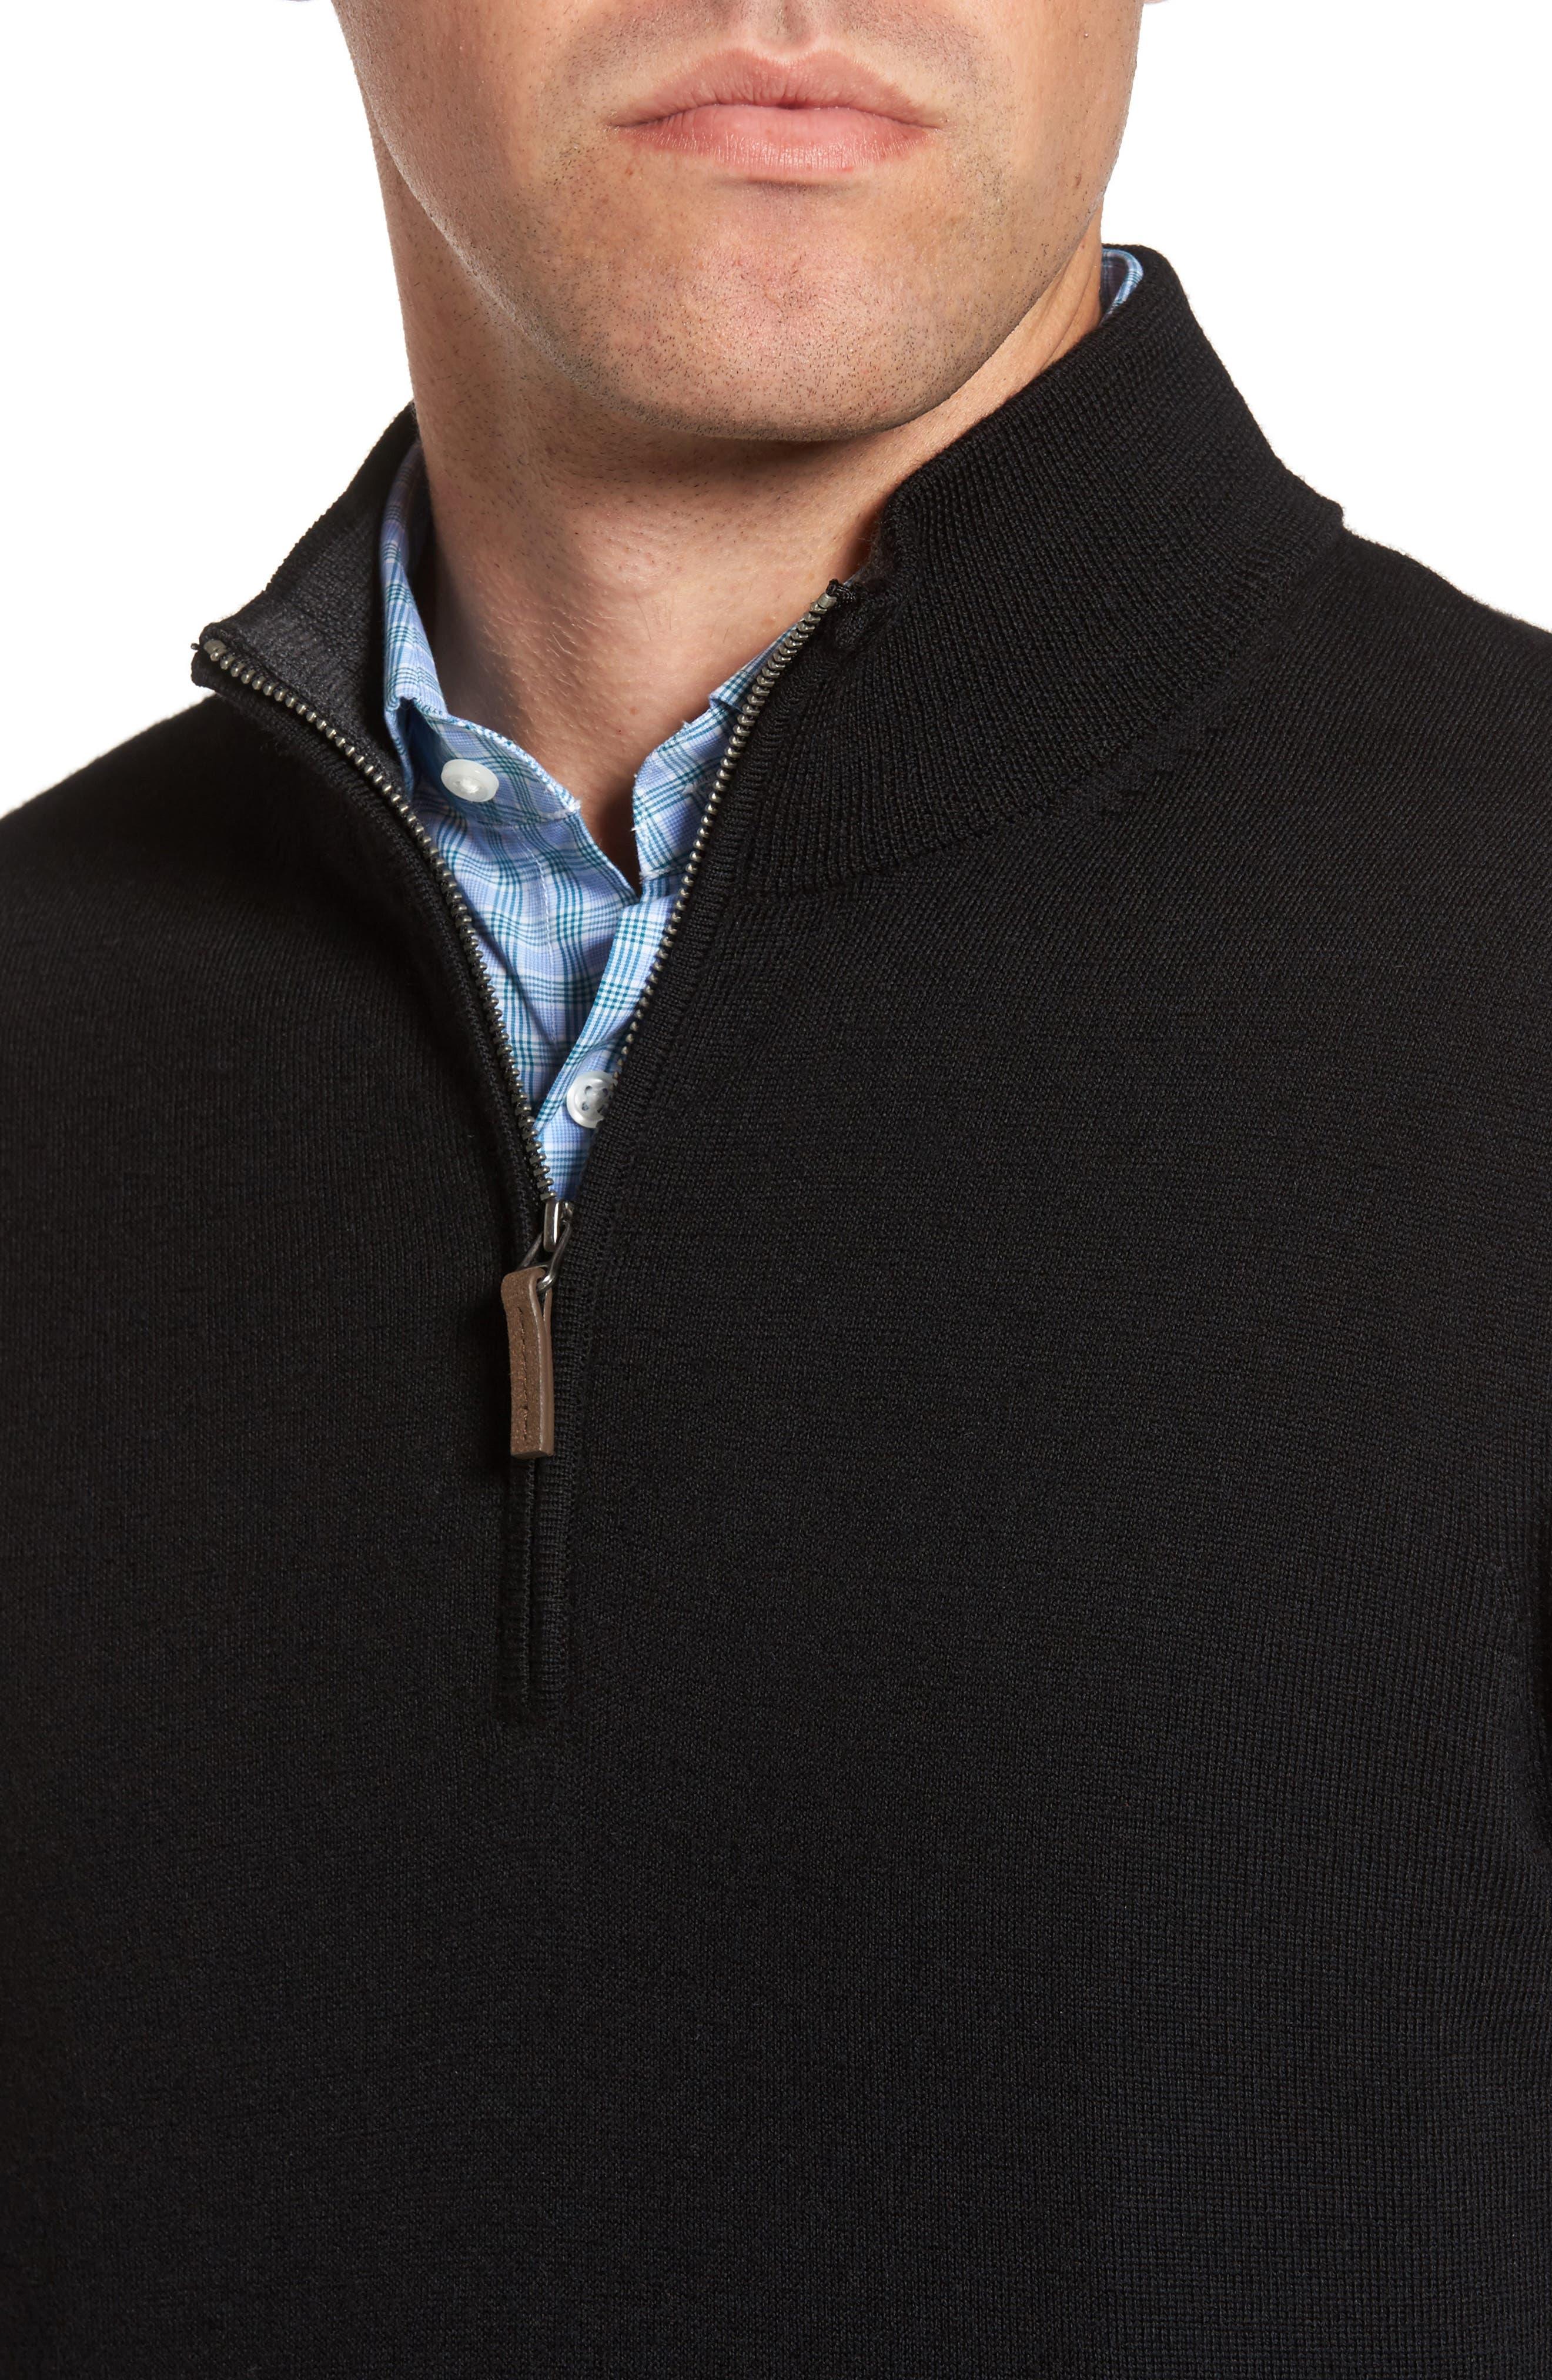 Quarter Zip Wool Pullover,                             Alternate thumbnail 4, color,                             Black Caviar